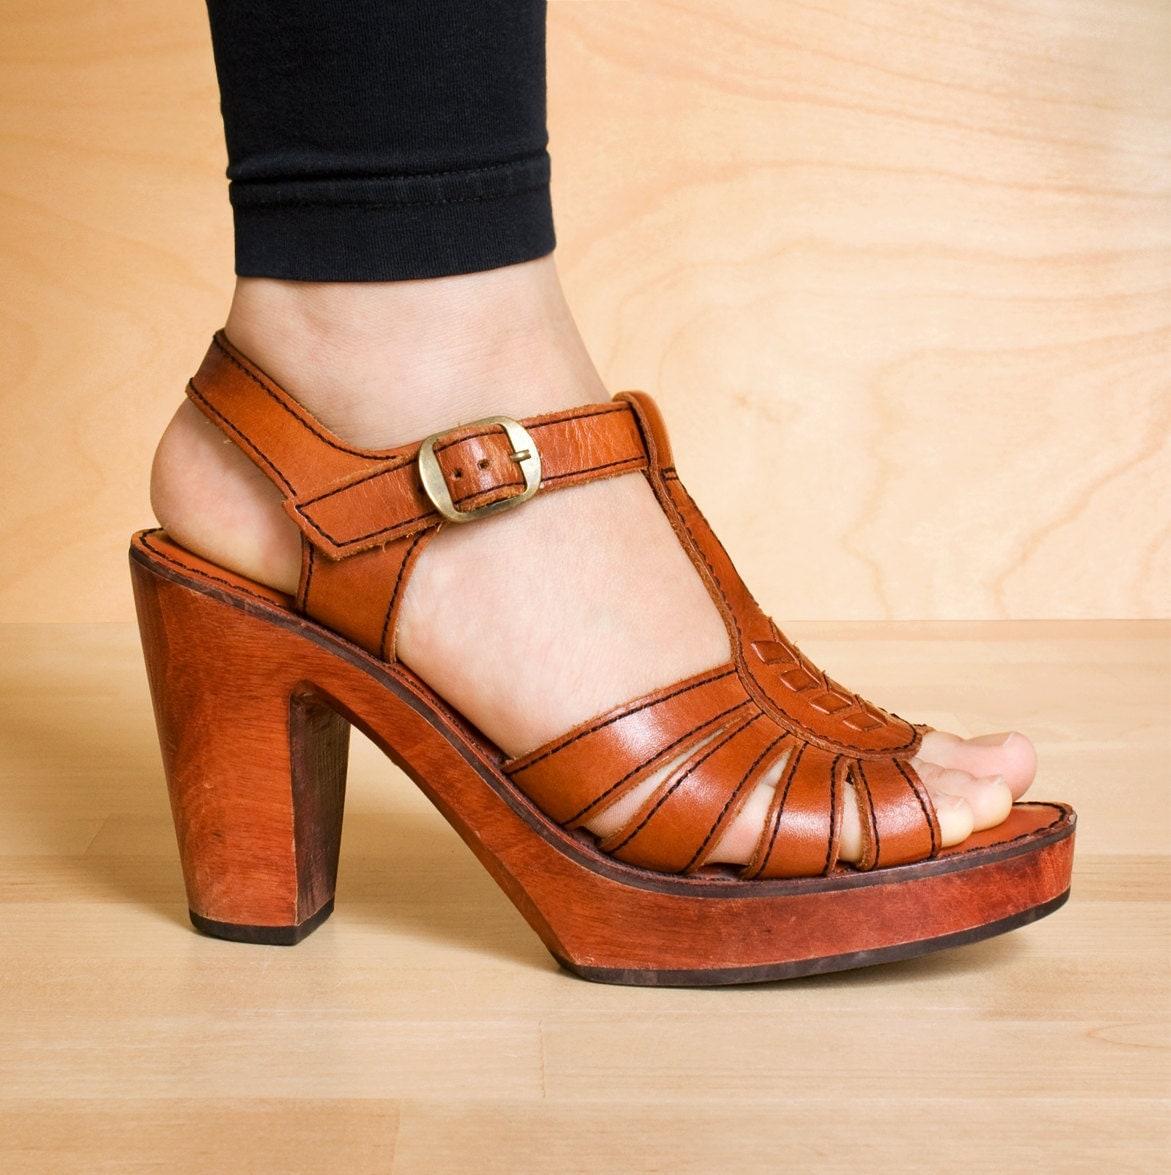 wood t platform shoes vintage leather by kenaione